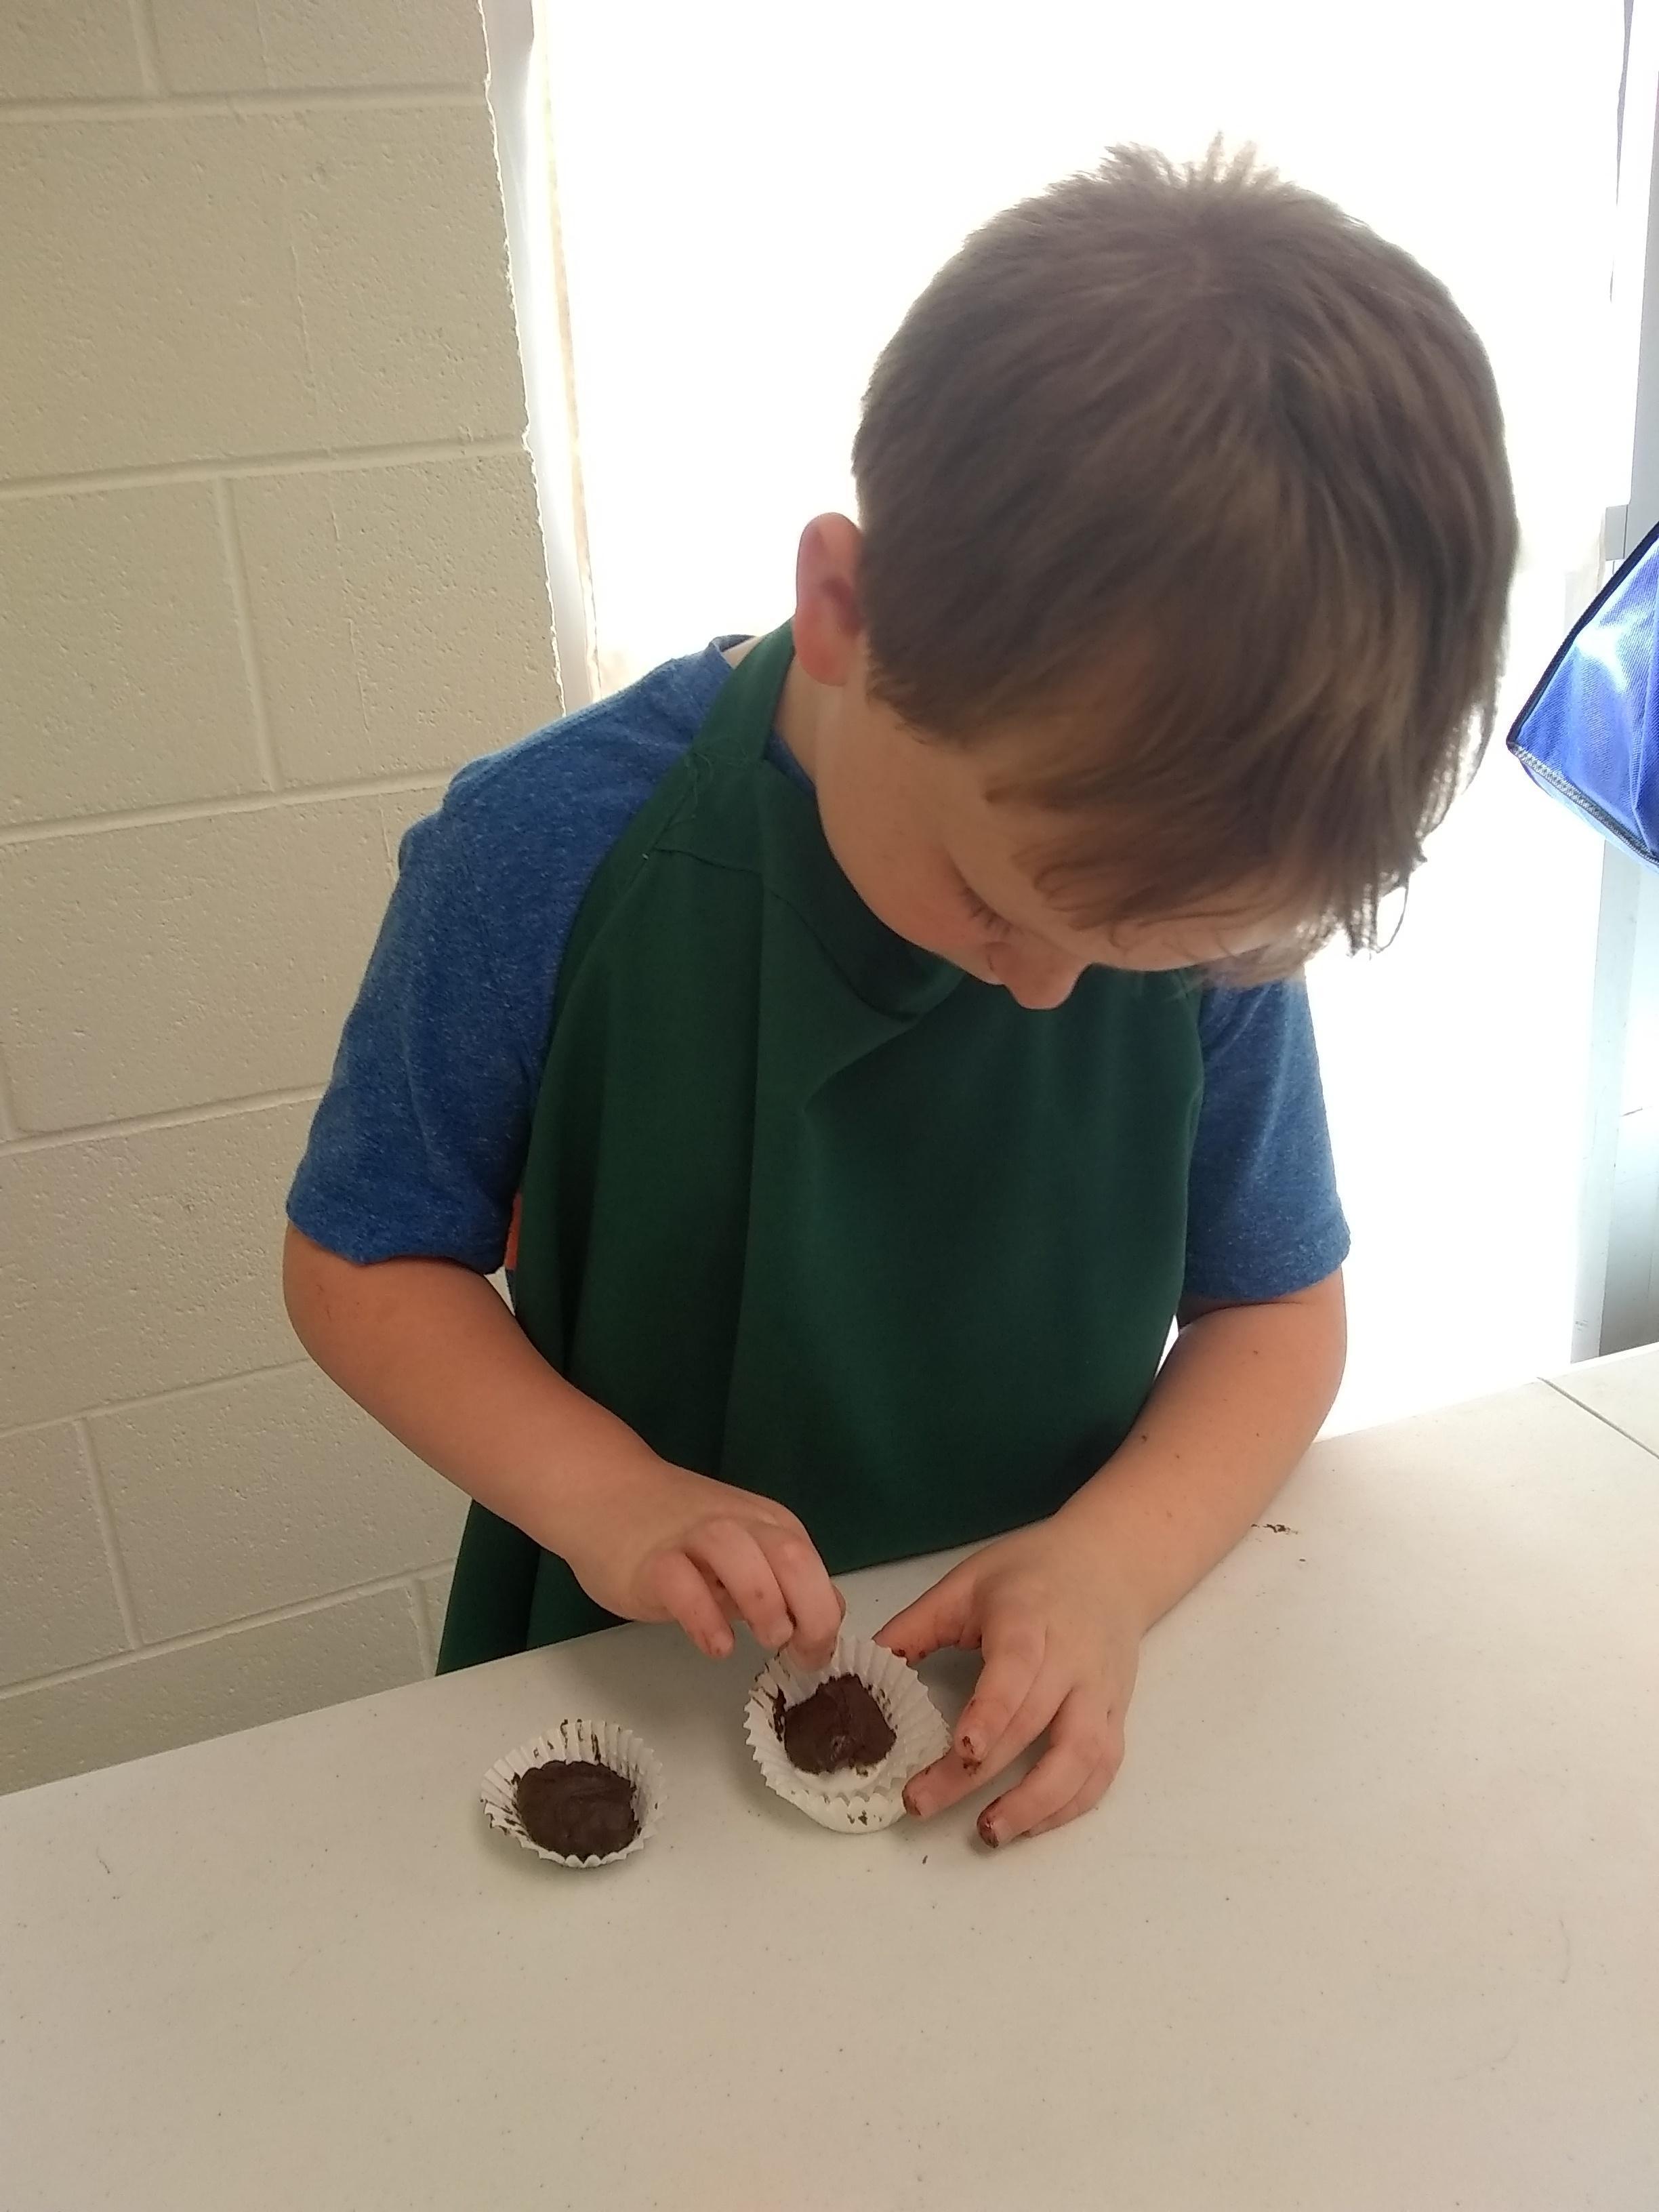 kids preparing chocolate together